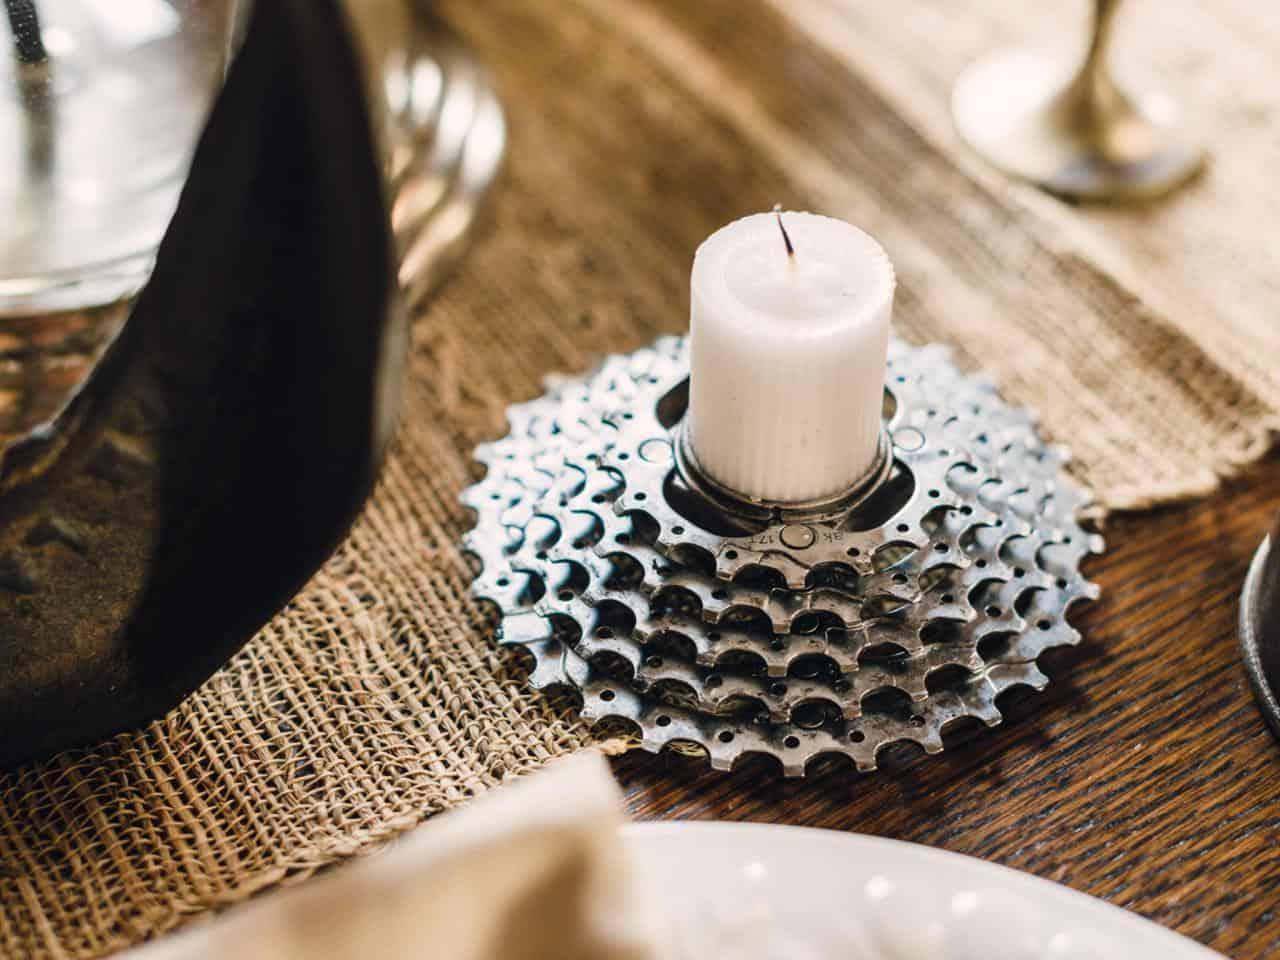 Biking gears candle holder